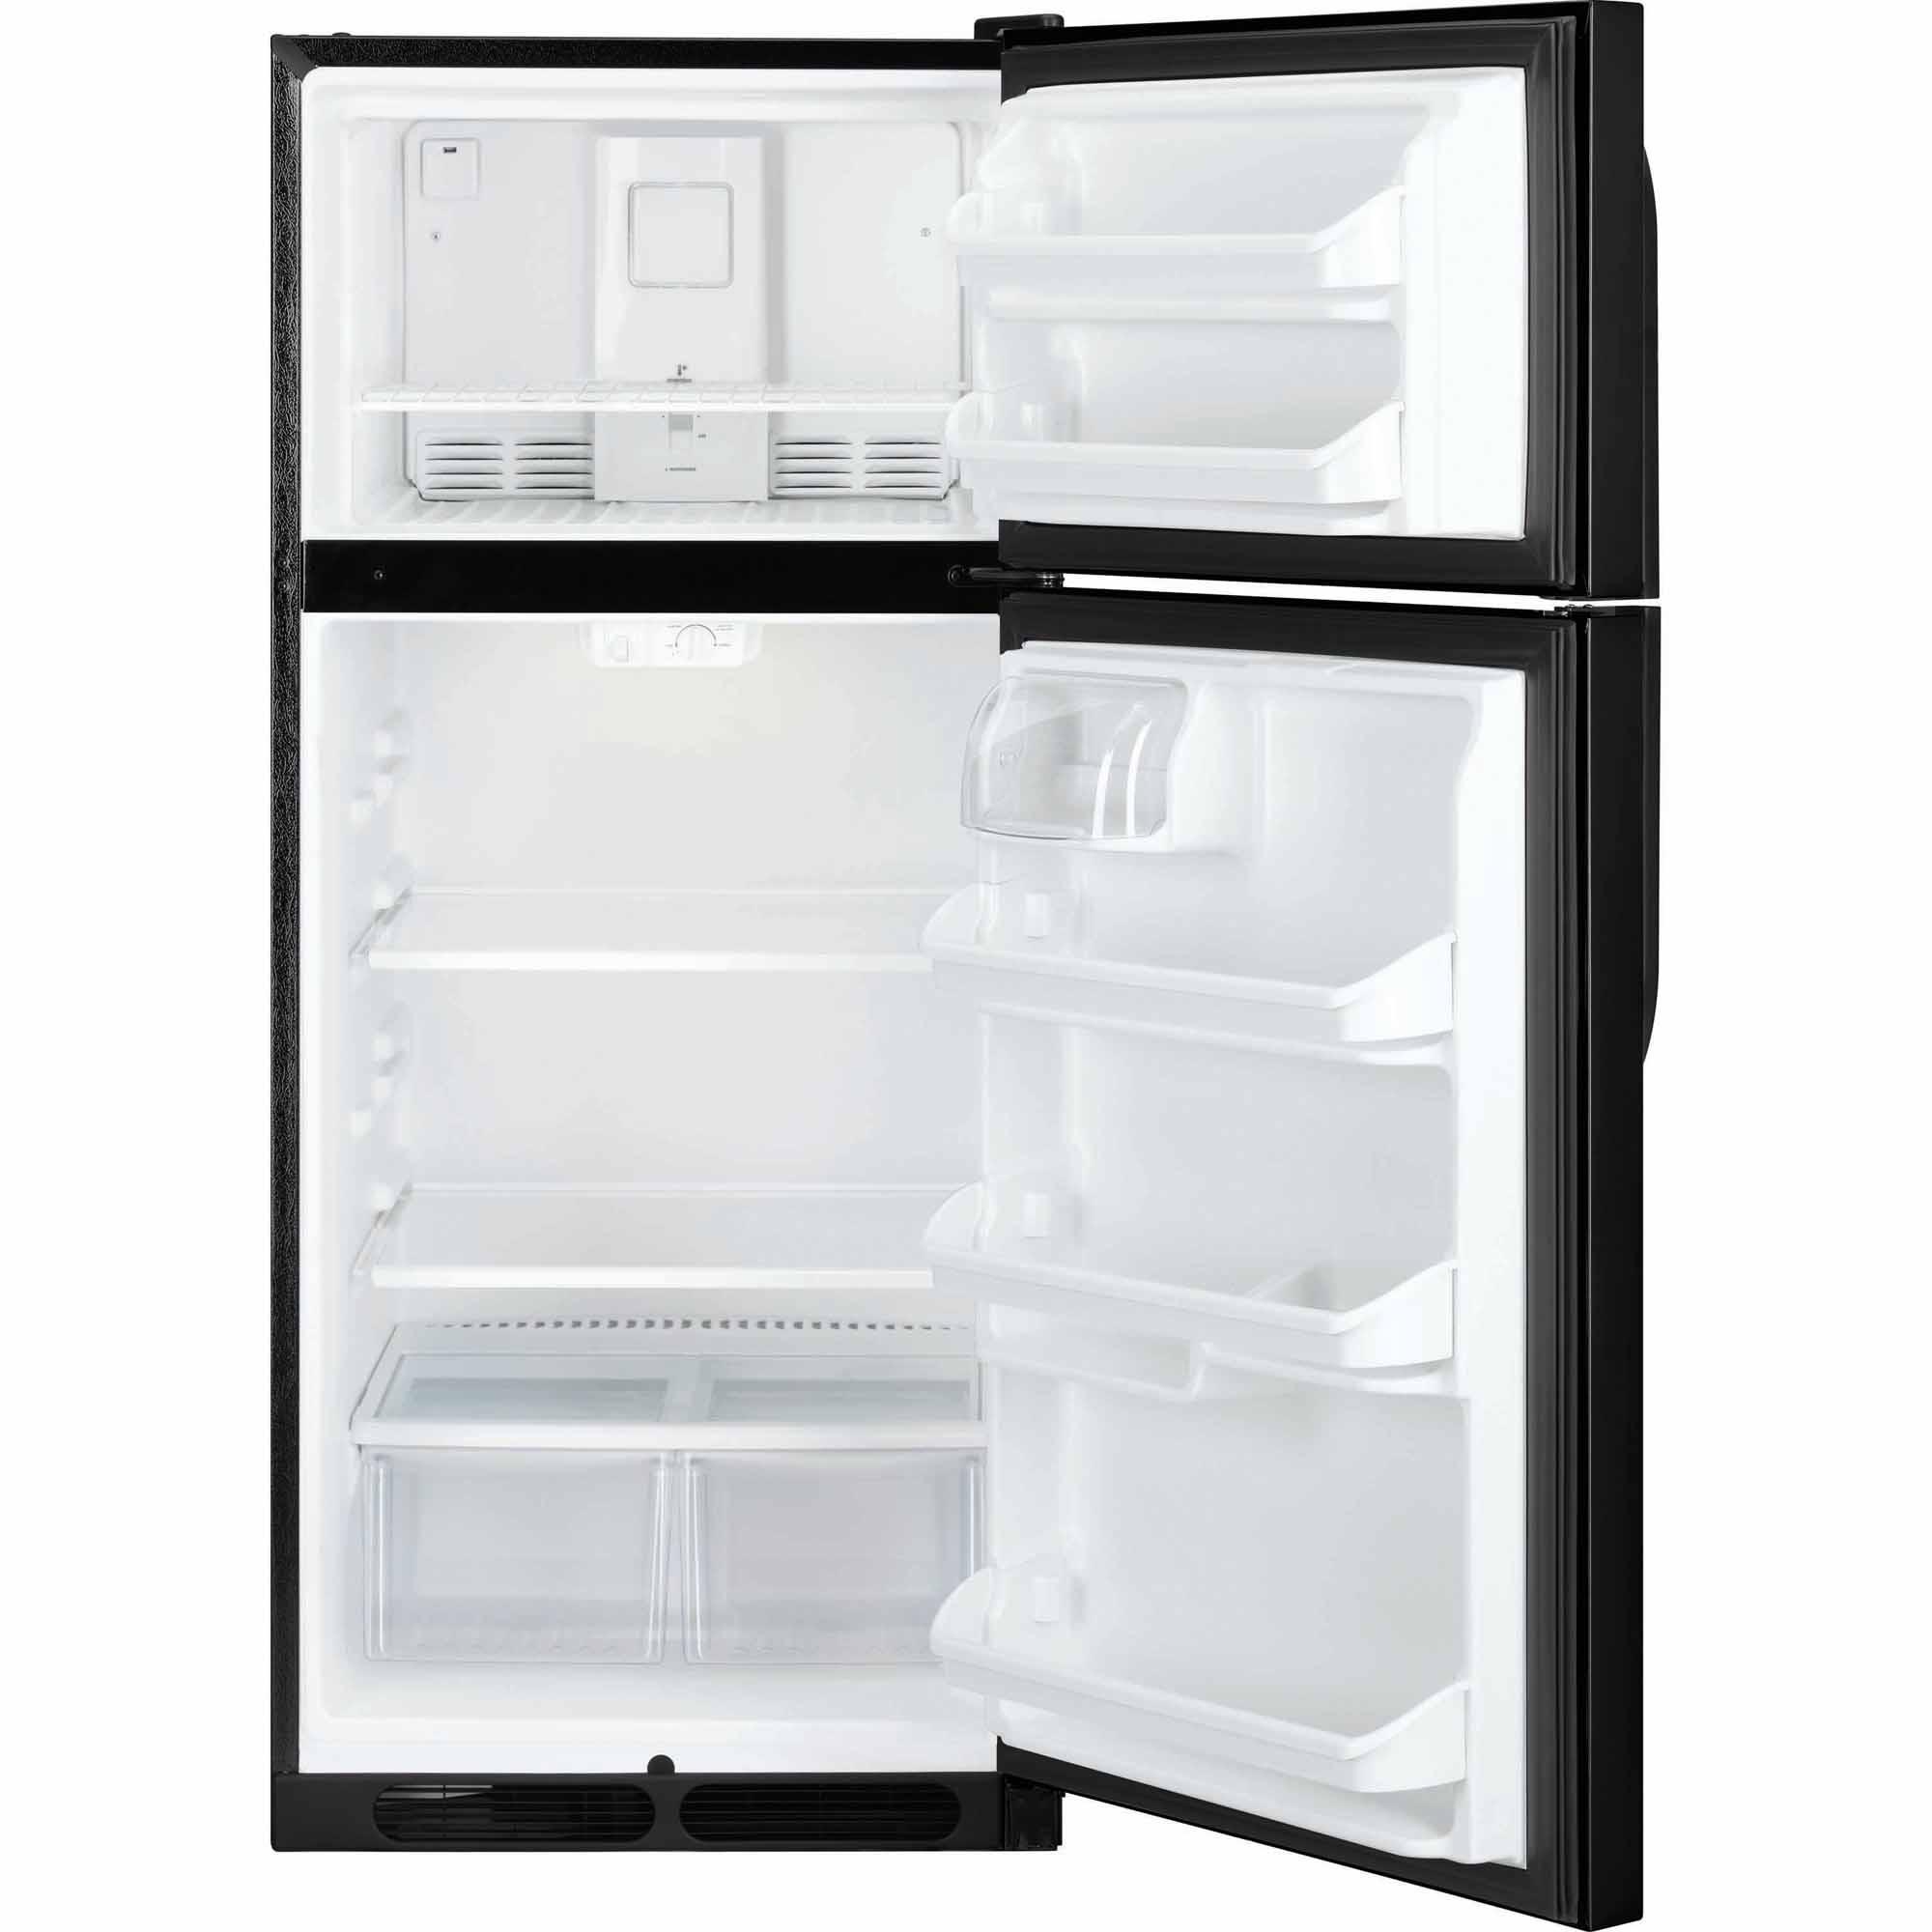 Kenmore 60409 16.3 cu. ft. Top Freezer Refrigerator - Black